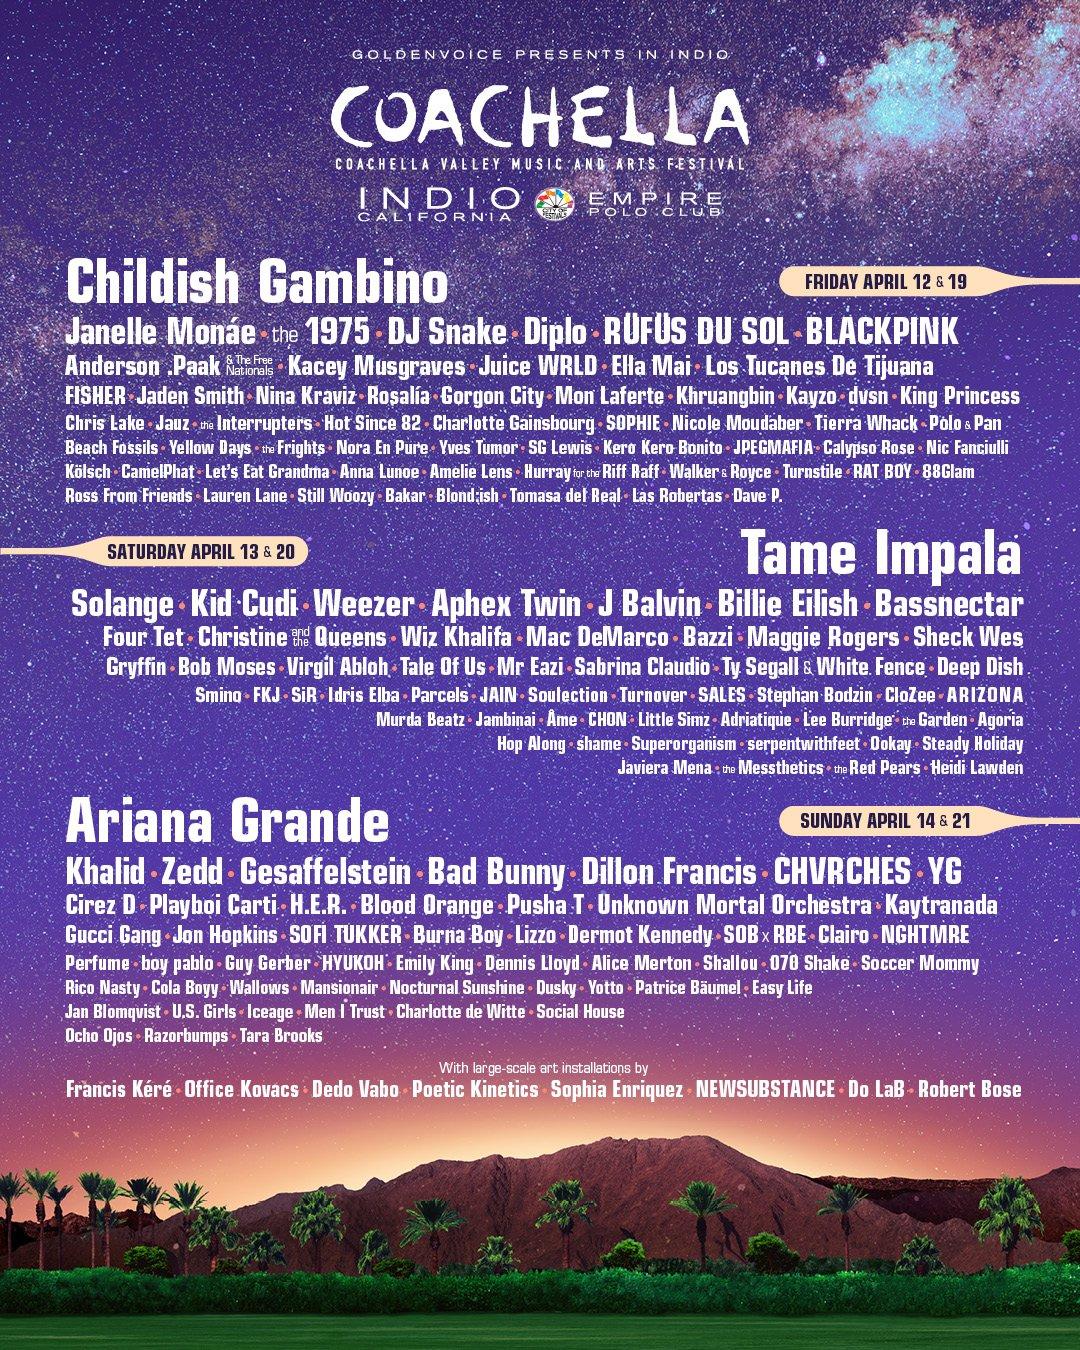 2019 coachella line up music festival lineup